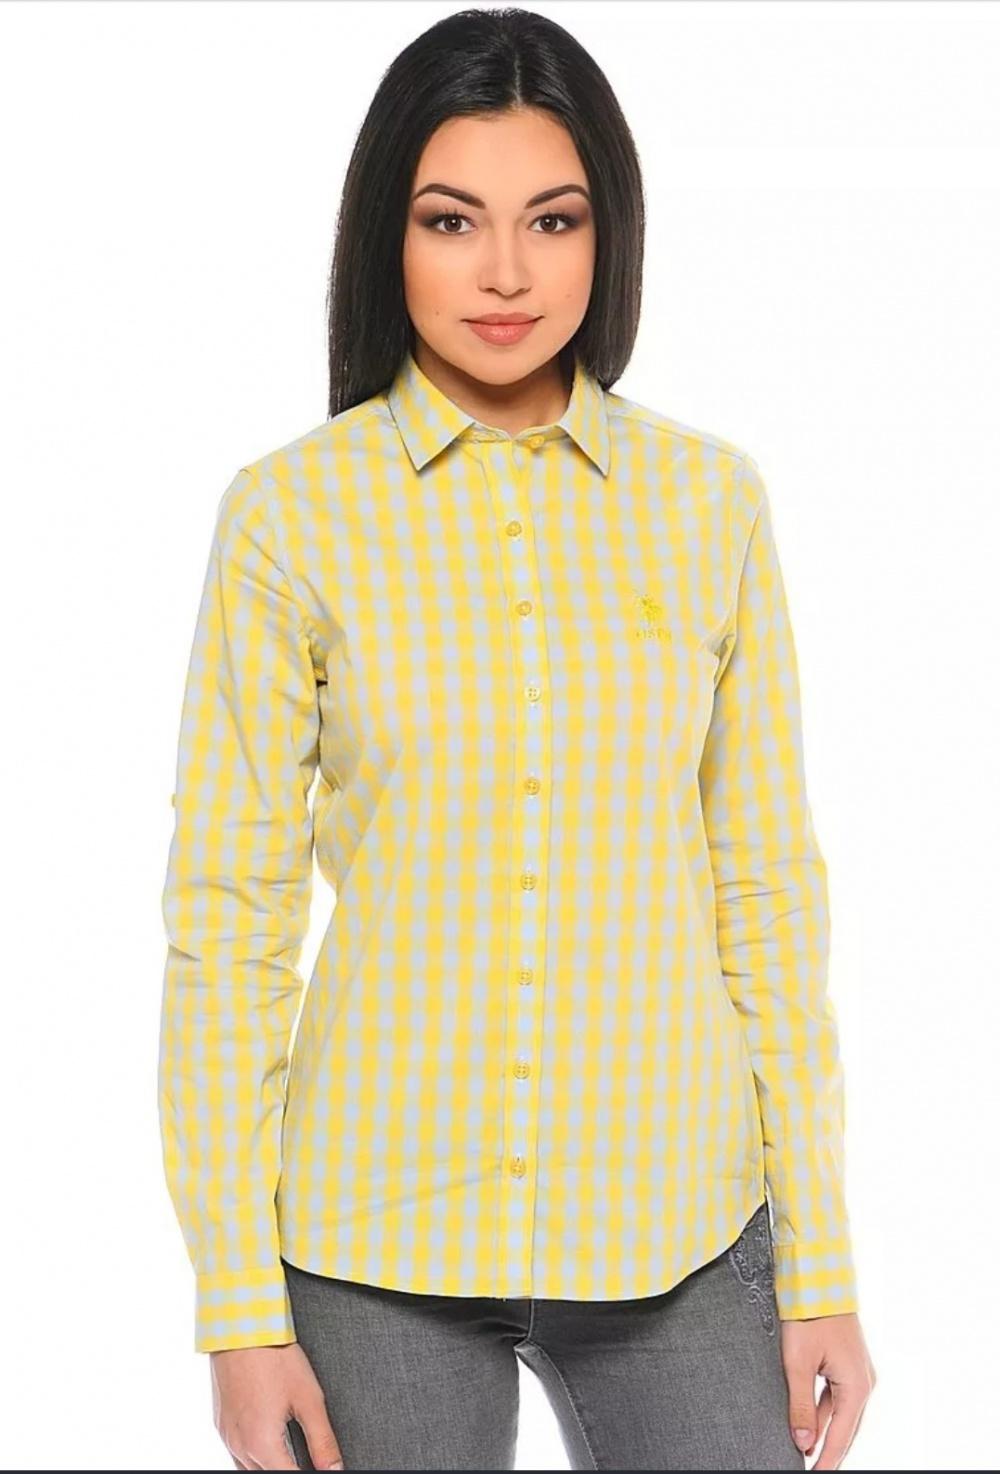 Рубашка U.S. Polo ASSN, 42-44 росс.